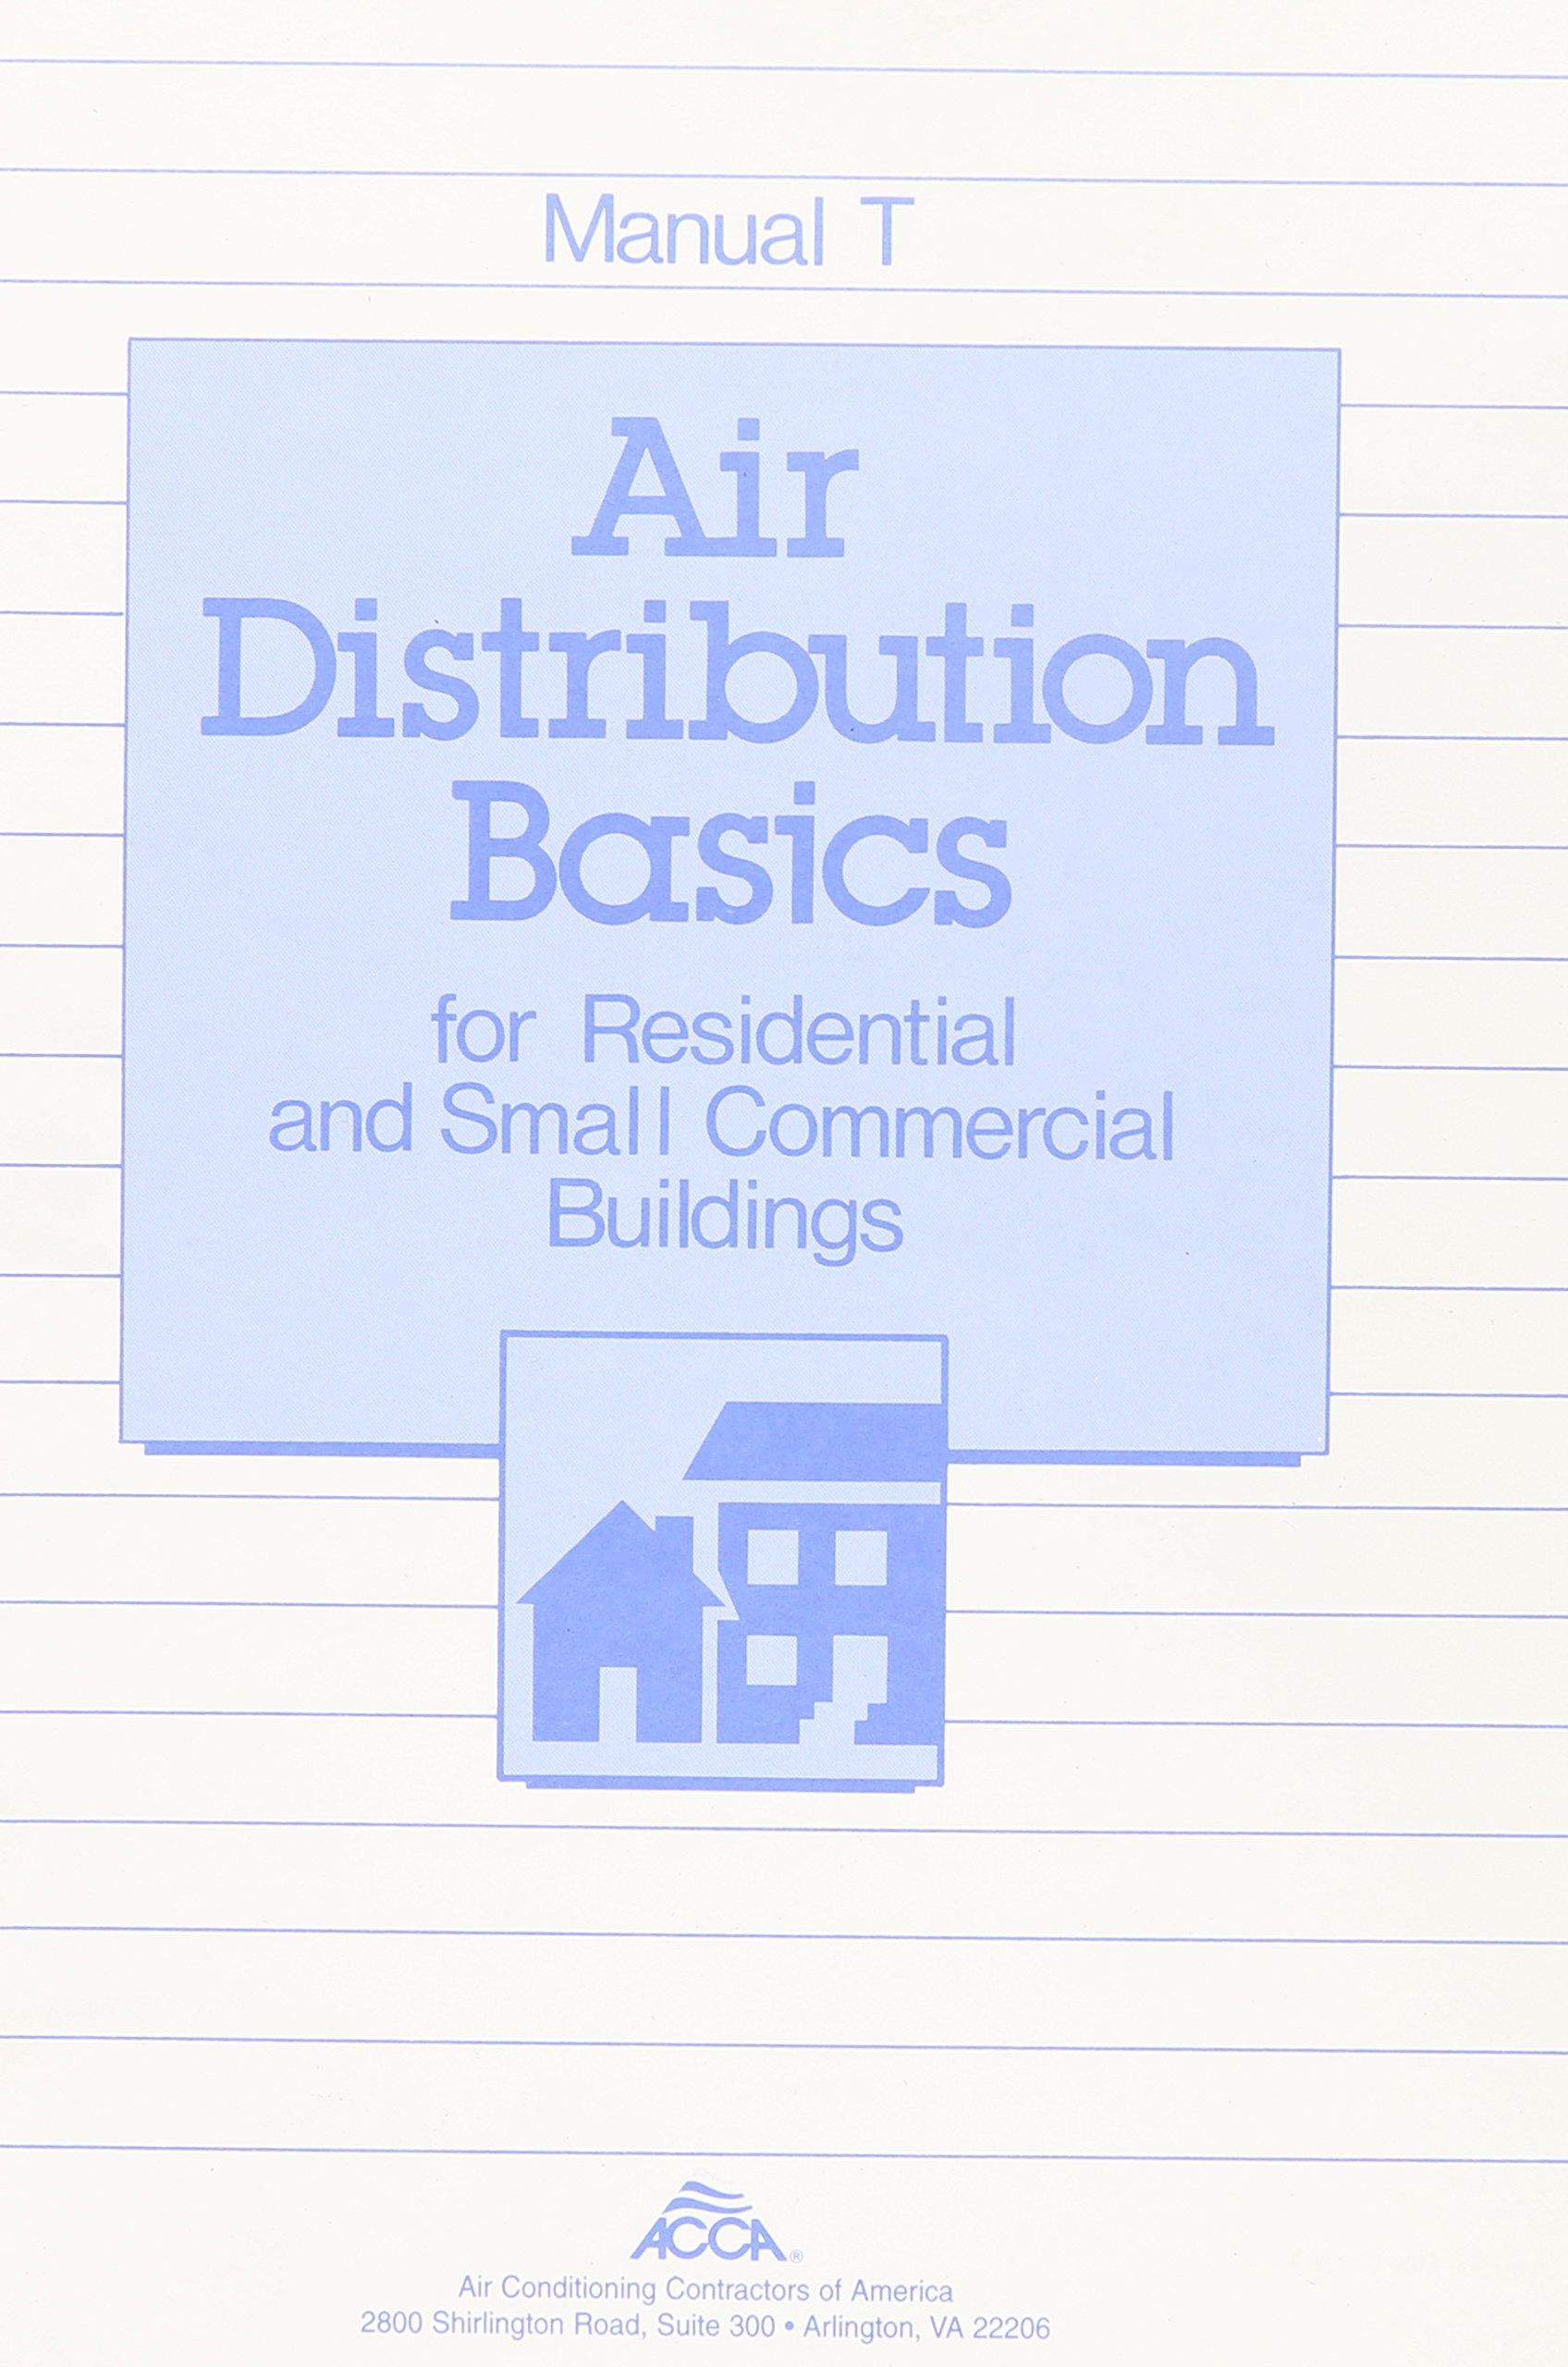 Manual T: Air Distribution Basics for Residential & Small Commercial  Buildings: Hank Rutkowski, Hank Rutkowski: 9781892765062: Amazon.com: Books